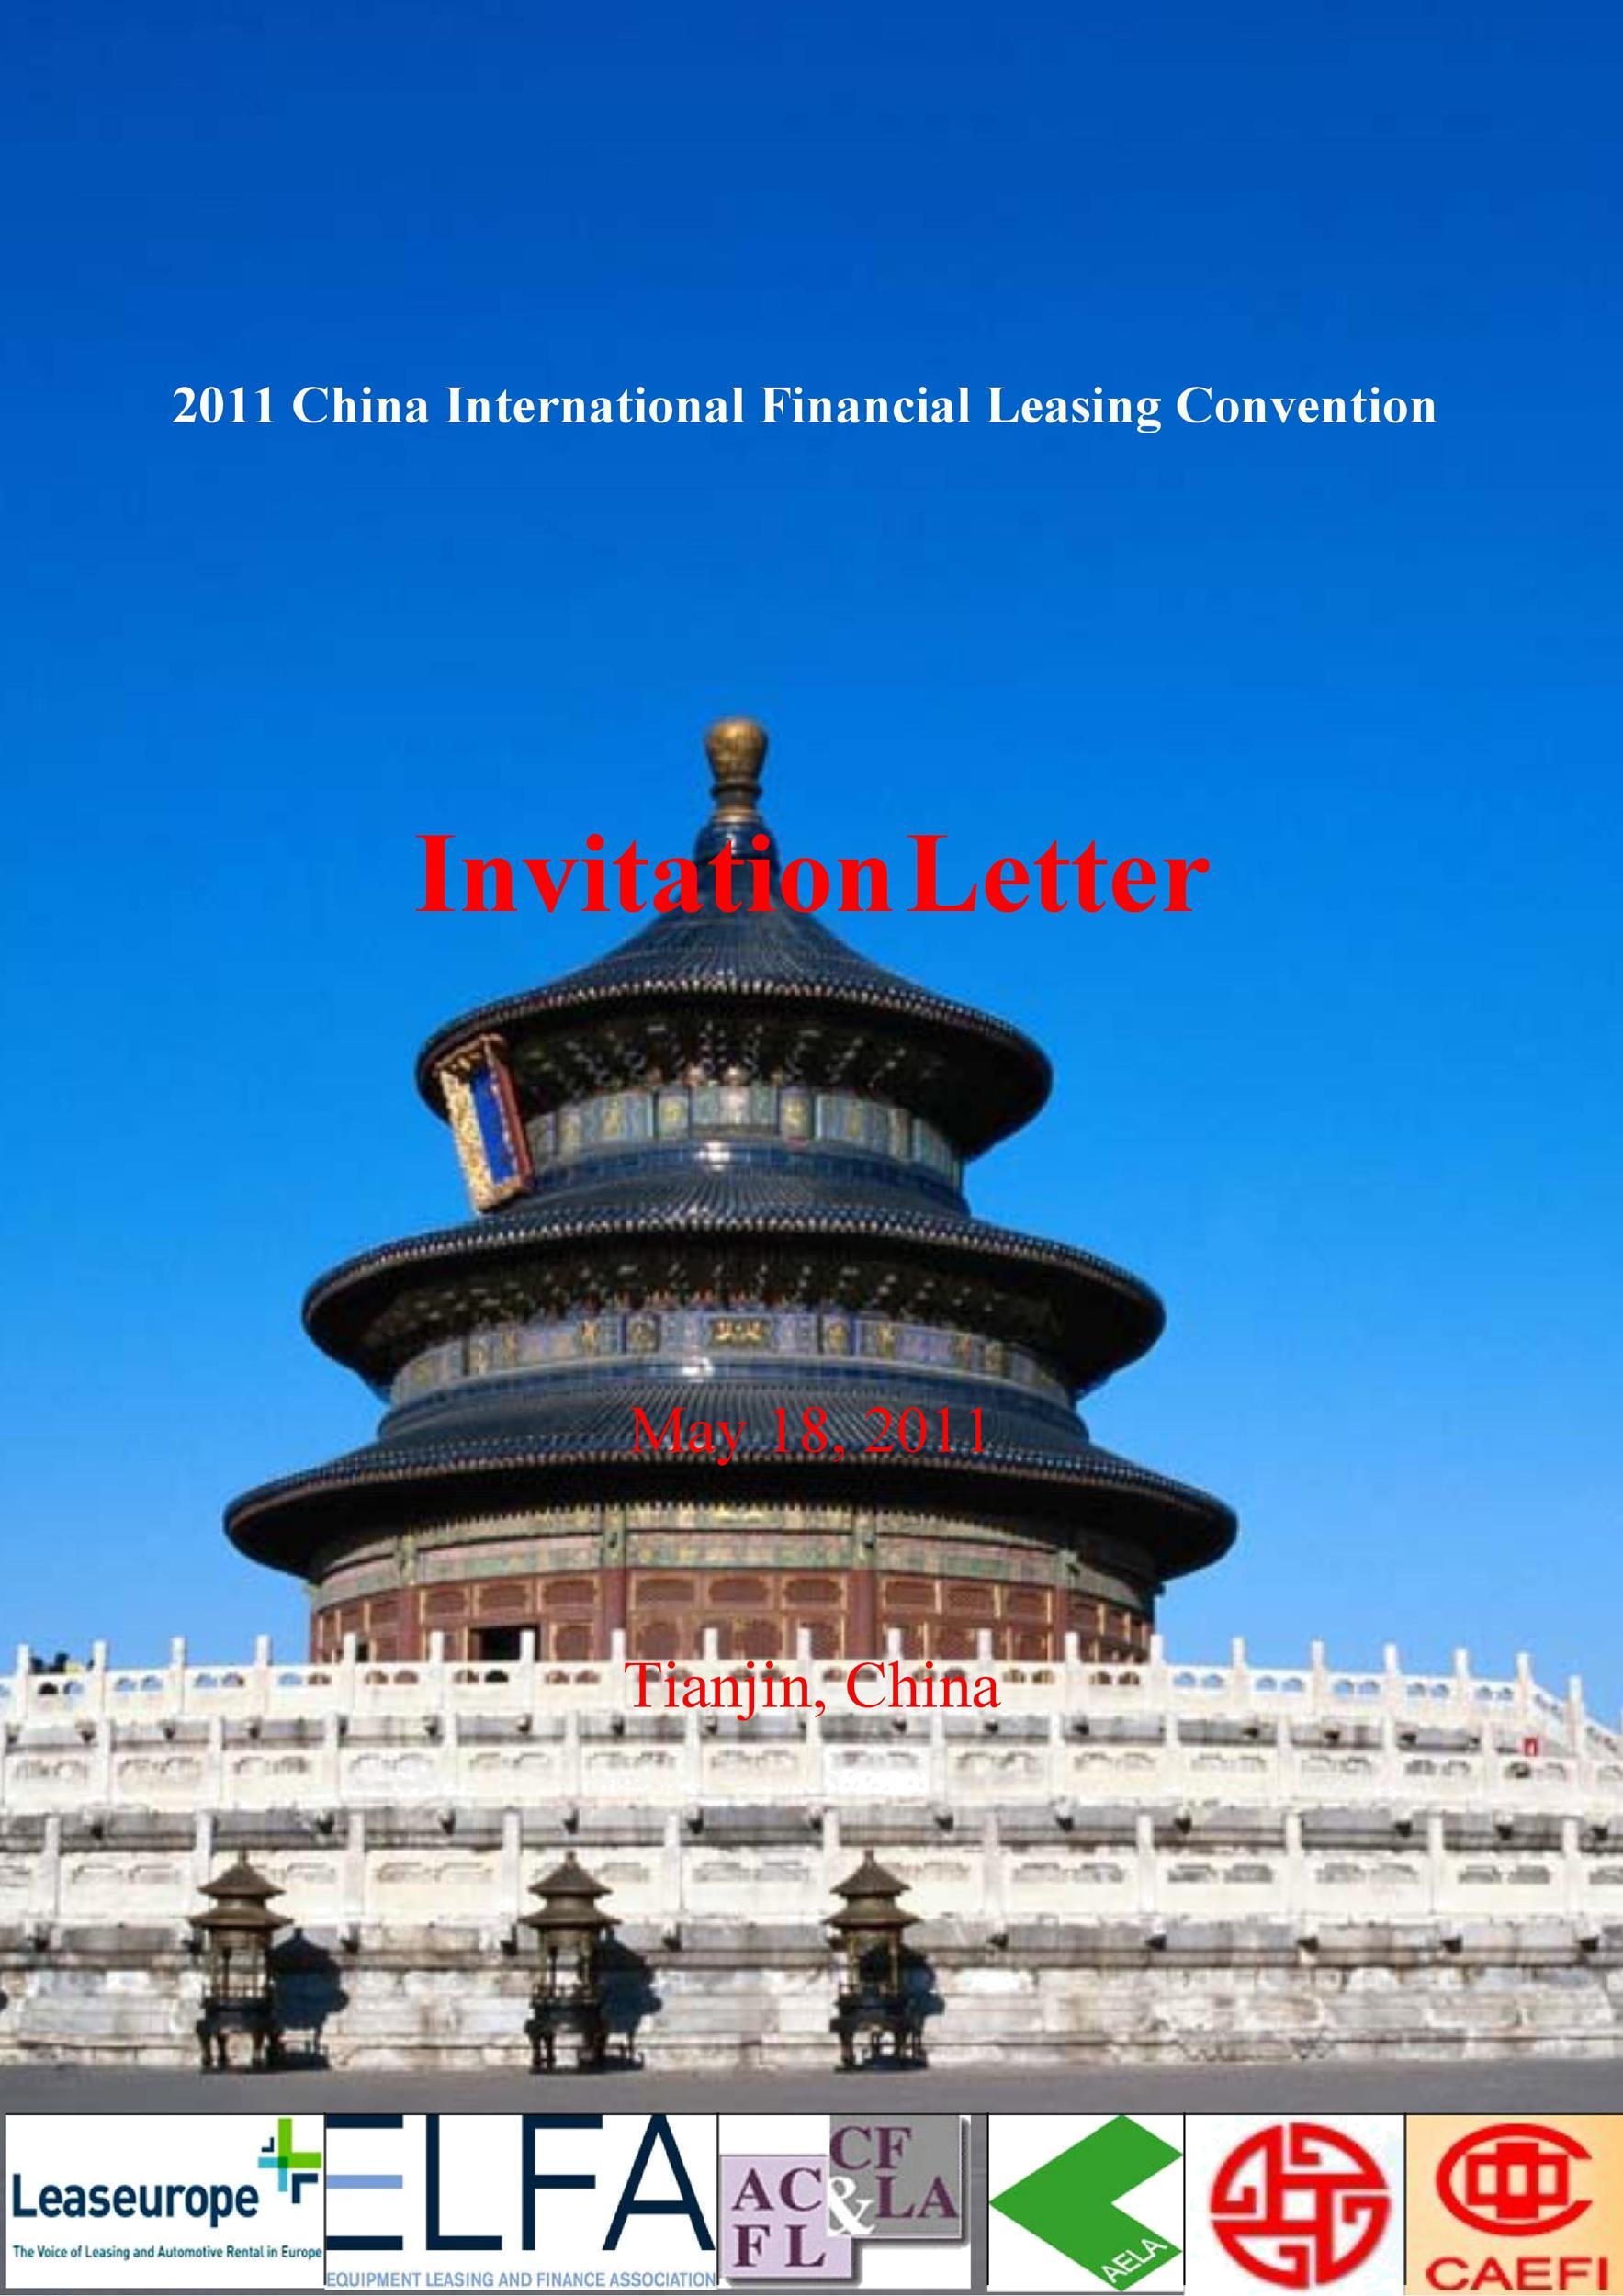 Free invitation letter 34